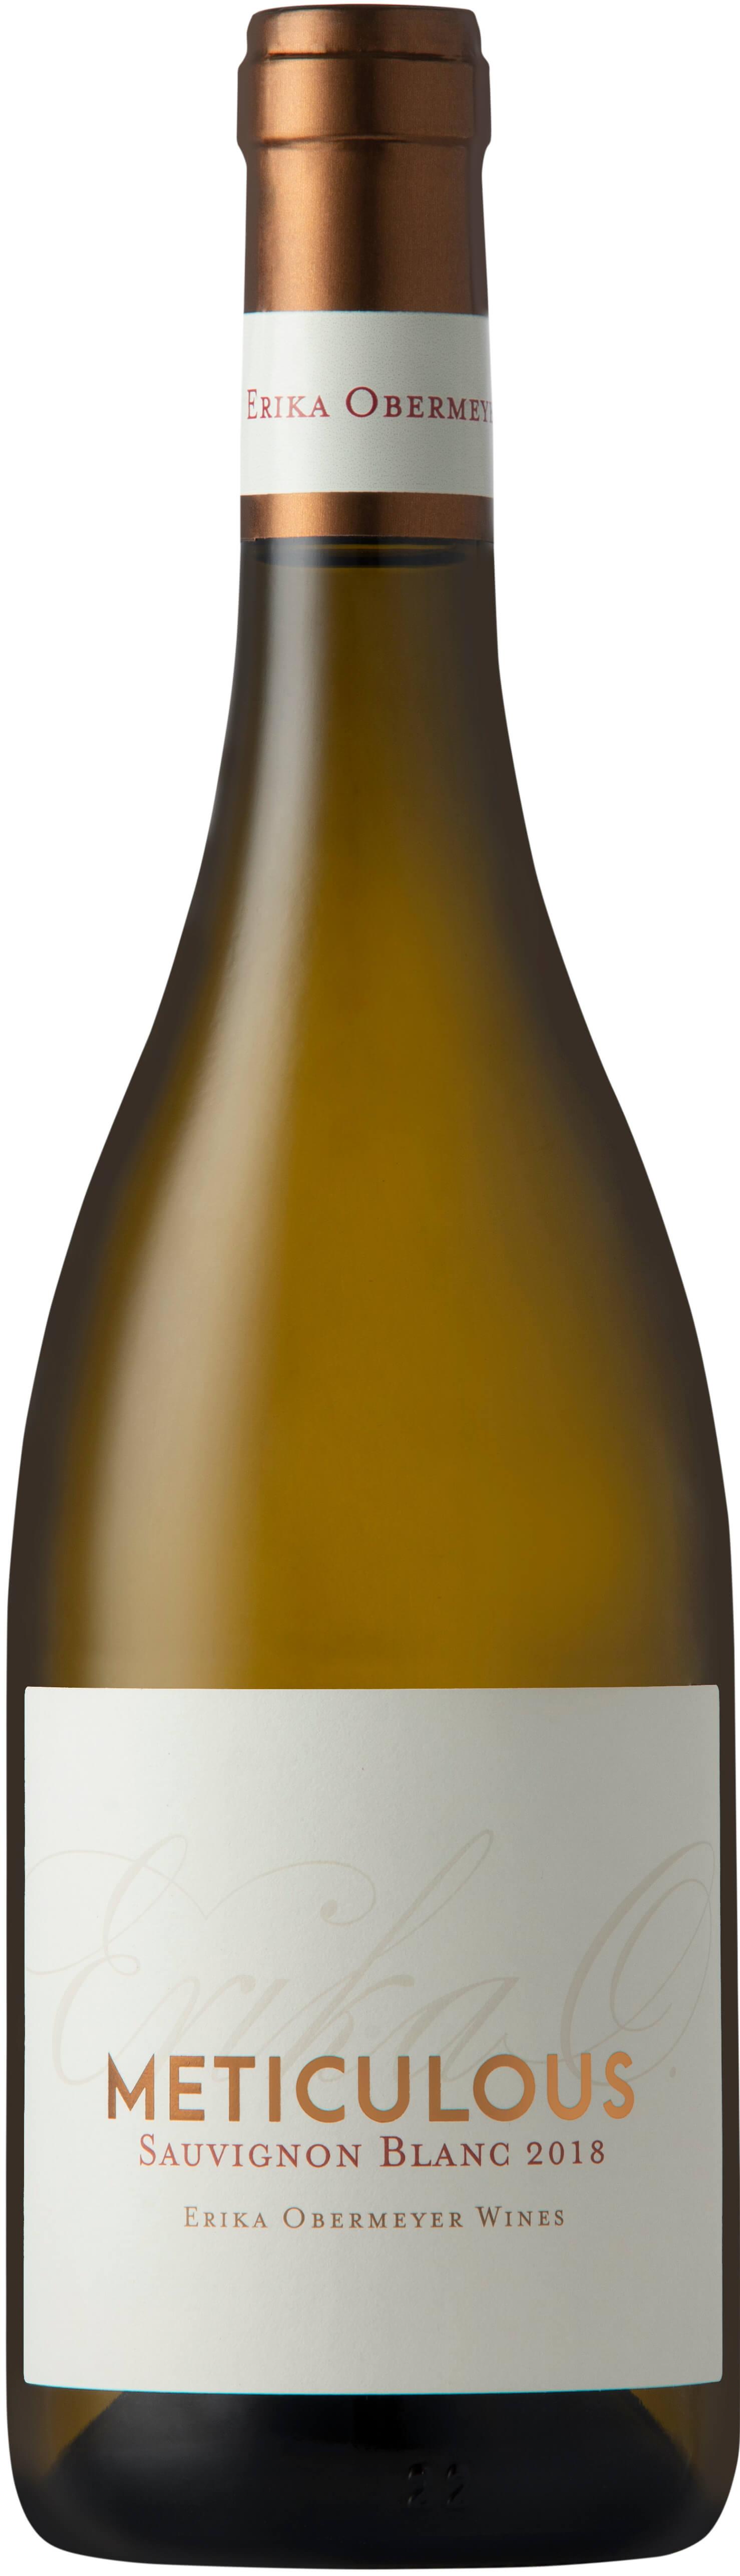 Erika O. Meticulous Sauvignon Blanc 2018